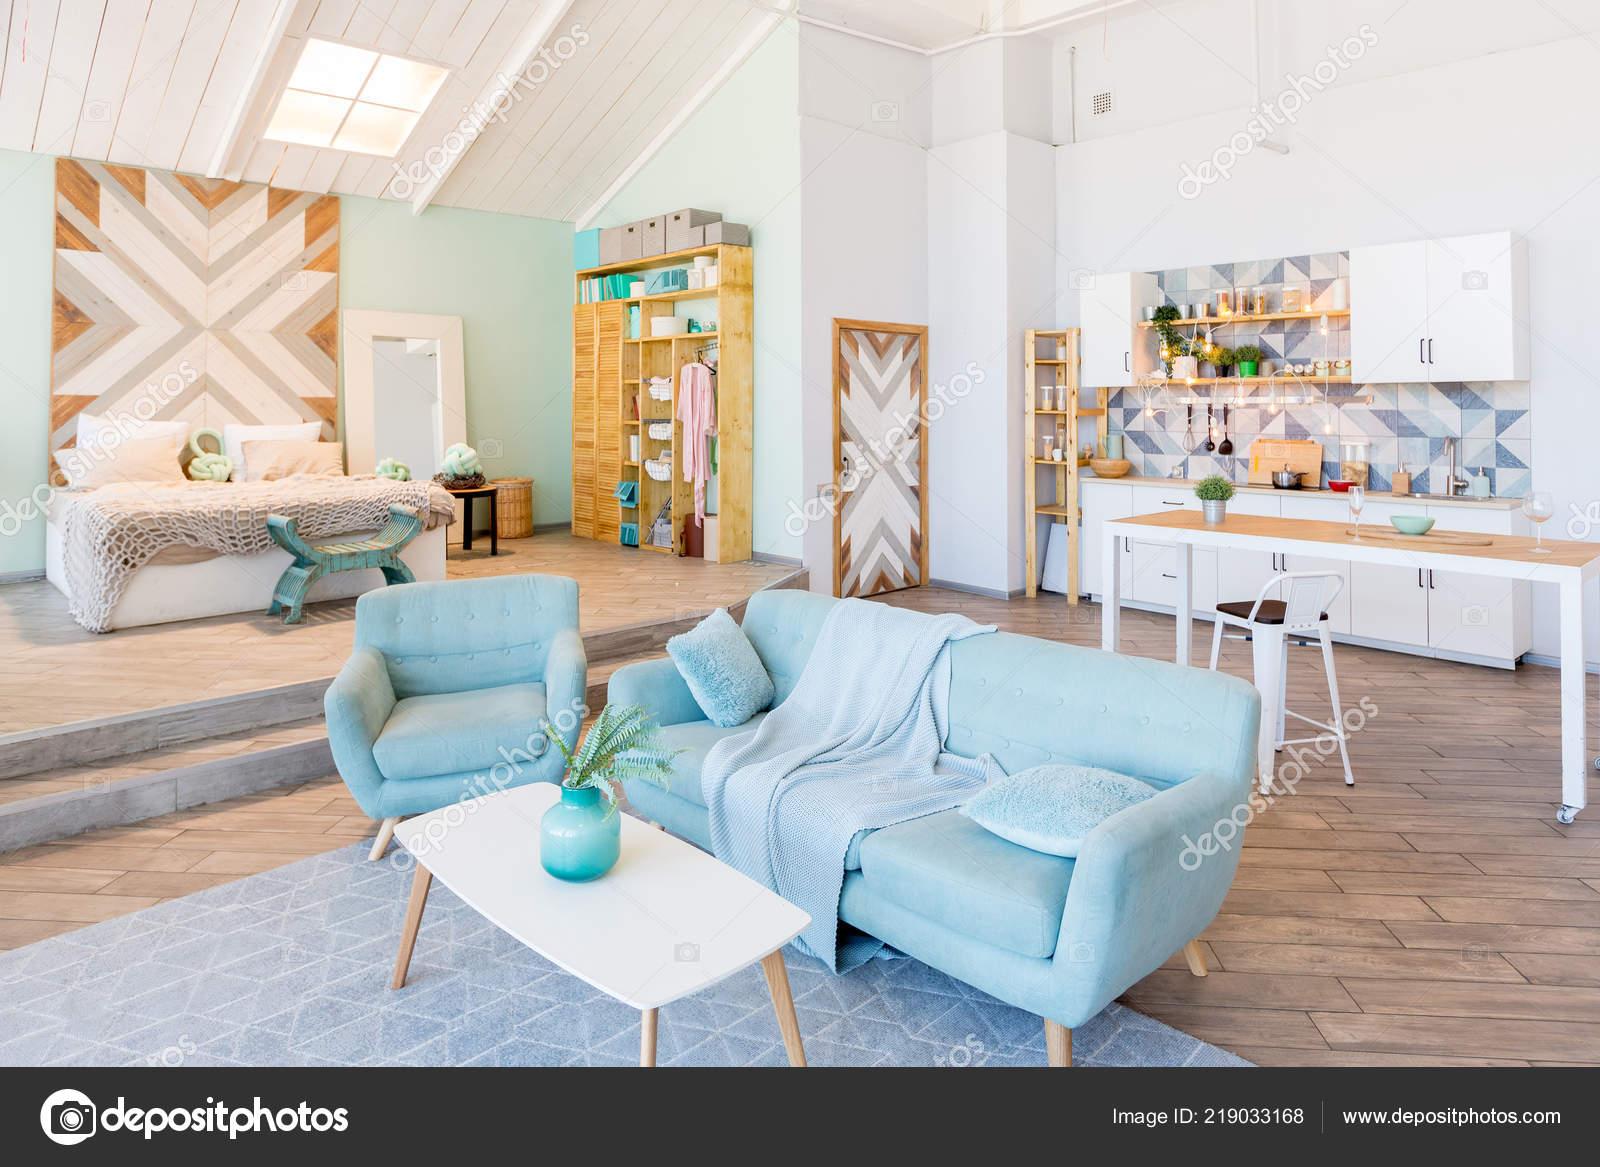 Stylish Luxury Living Room Interior Design Soft Day Light Elegant Stock Photo C Nokia Alexnet 219033168